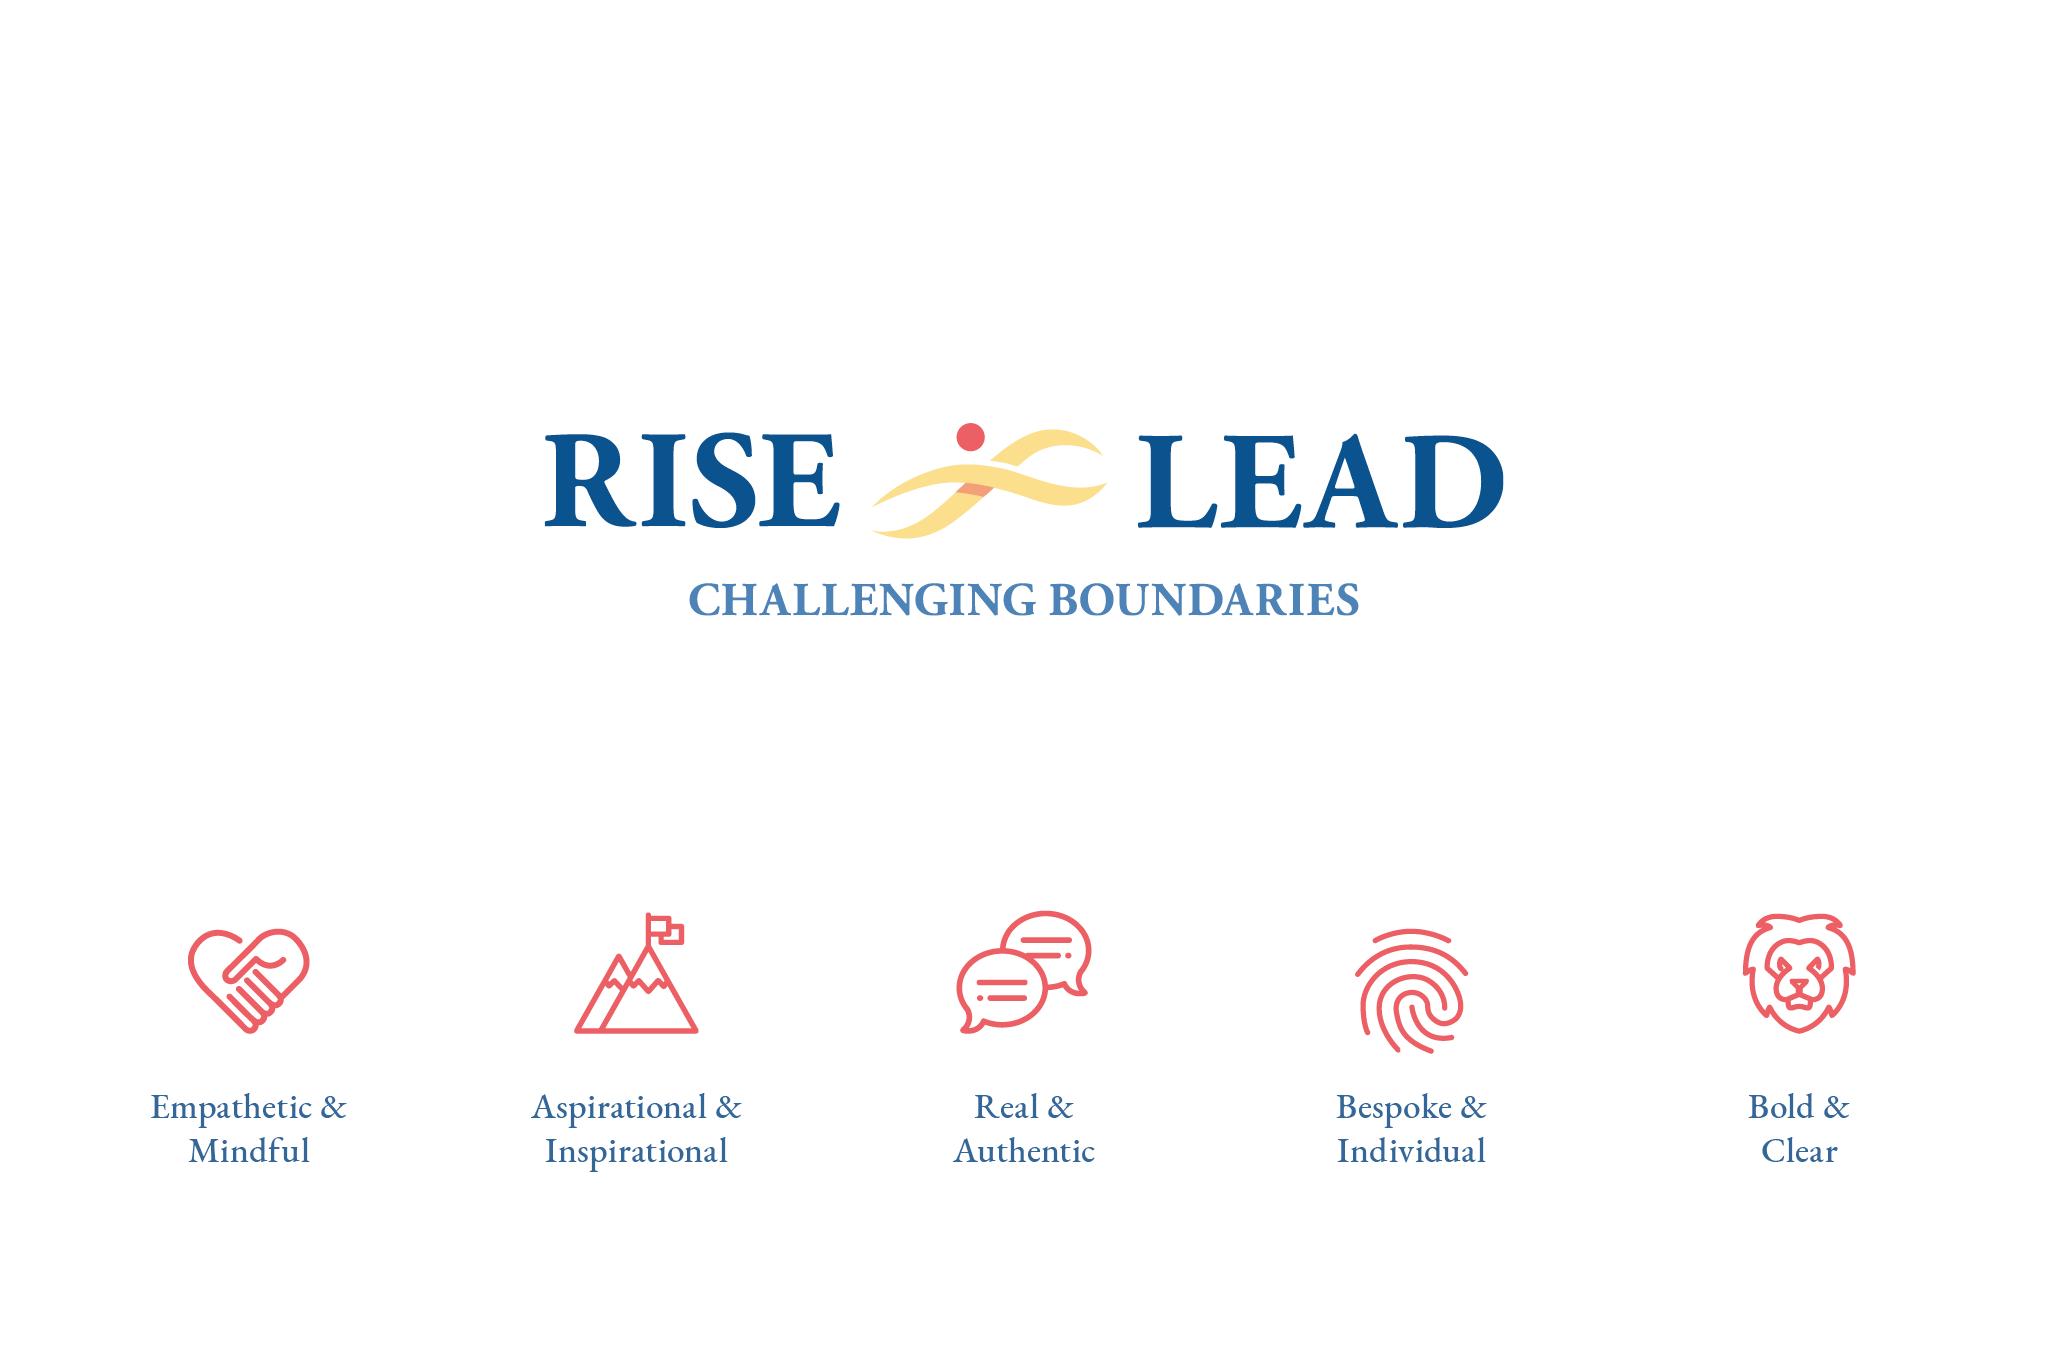 Rise & Lead Brand Identity & Values